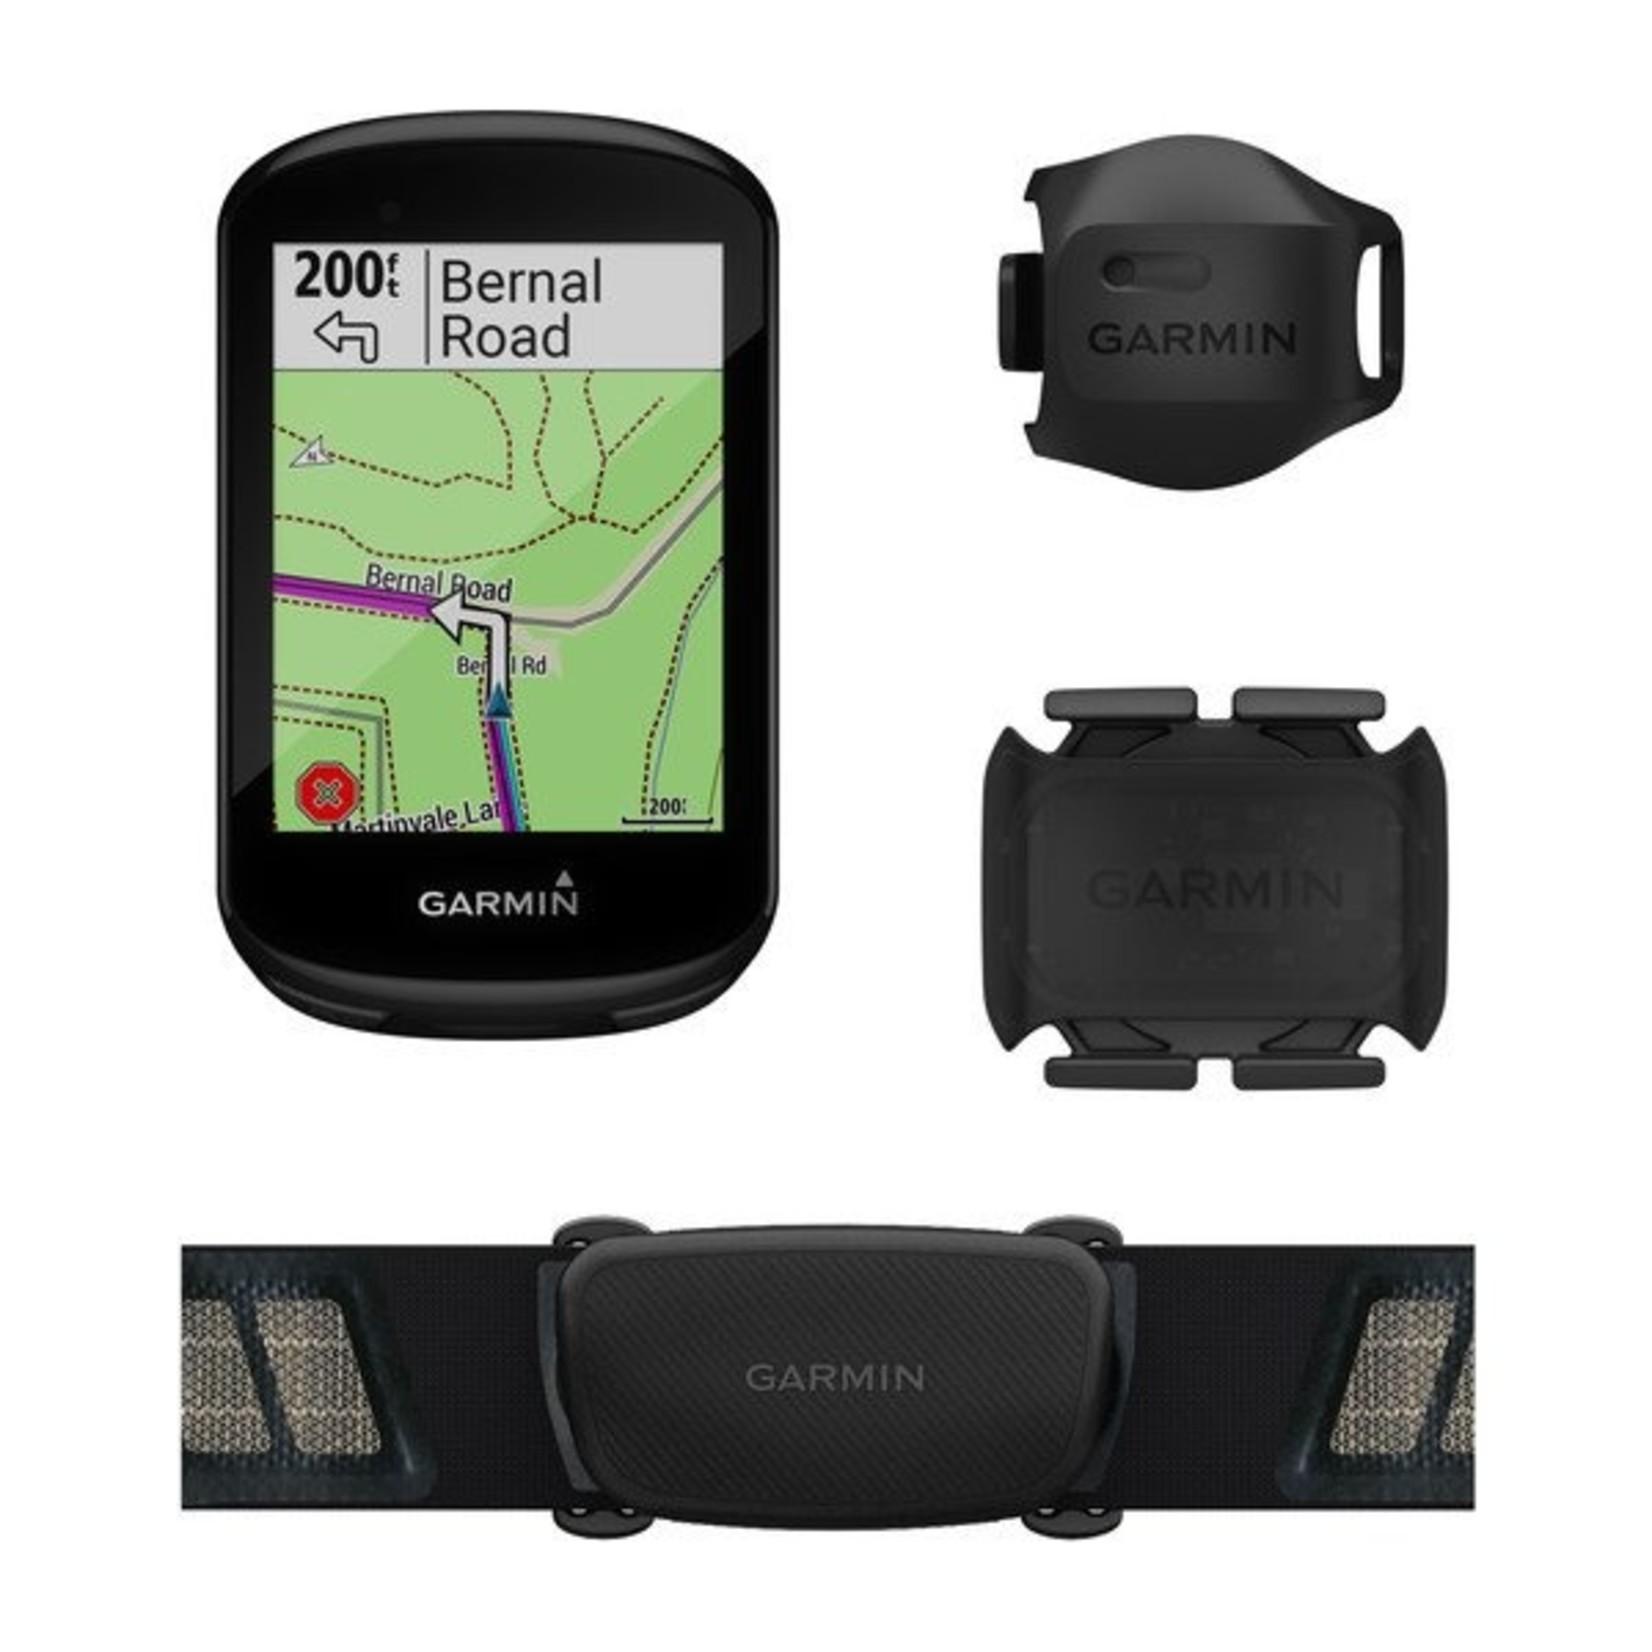 Garmin Garmin, Edge 830 Bundle, Computer, GPS: Yes, HR: Yes (Chest), Cadence: Yes, Black, 010-02061-10